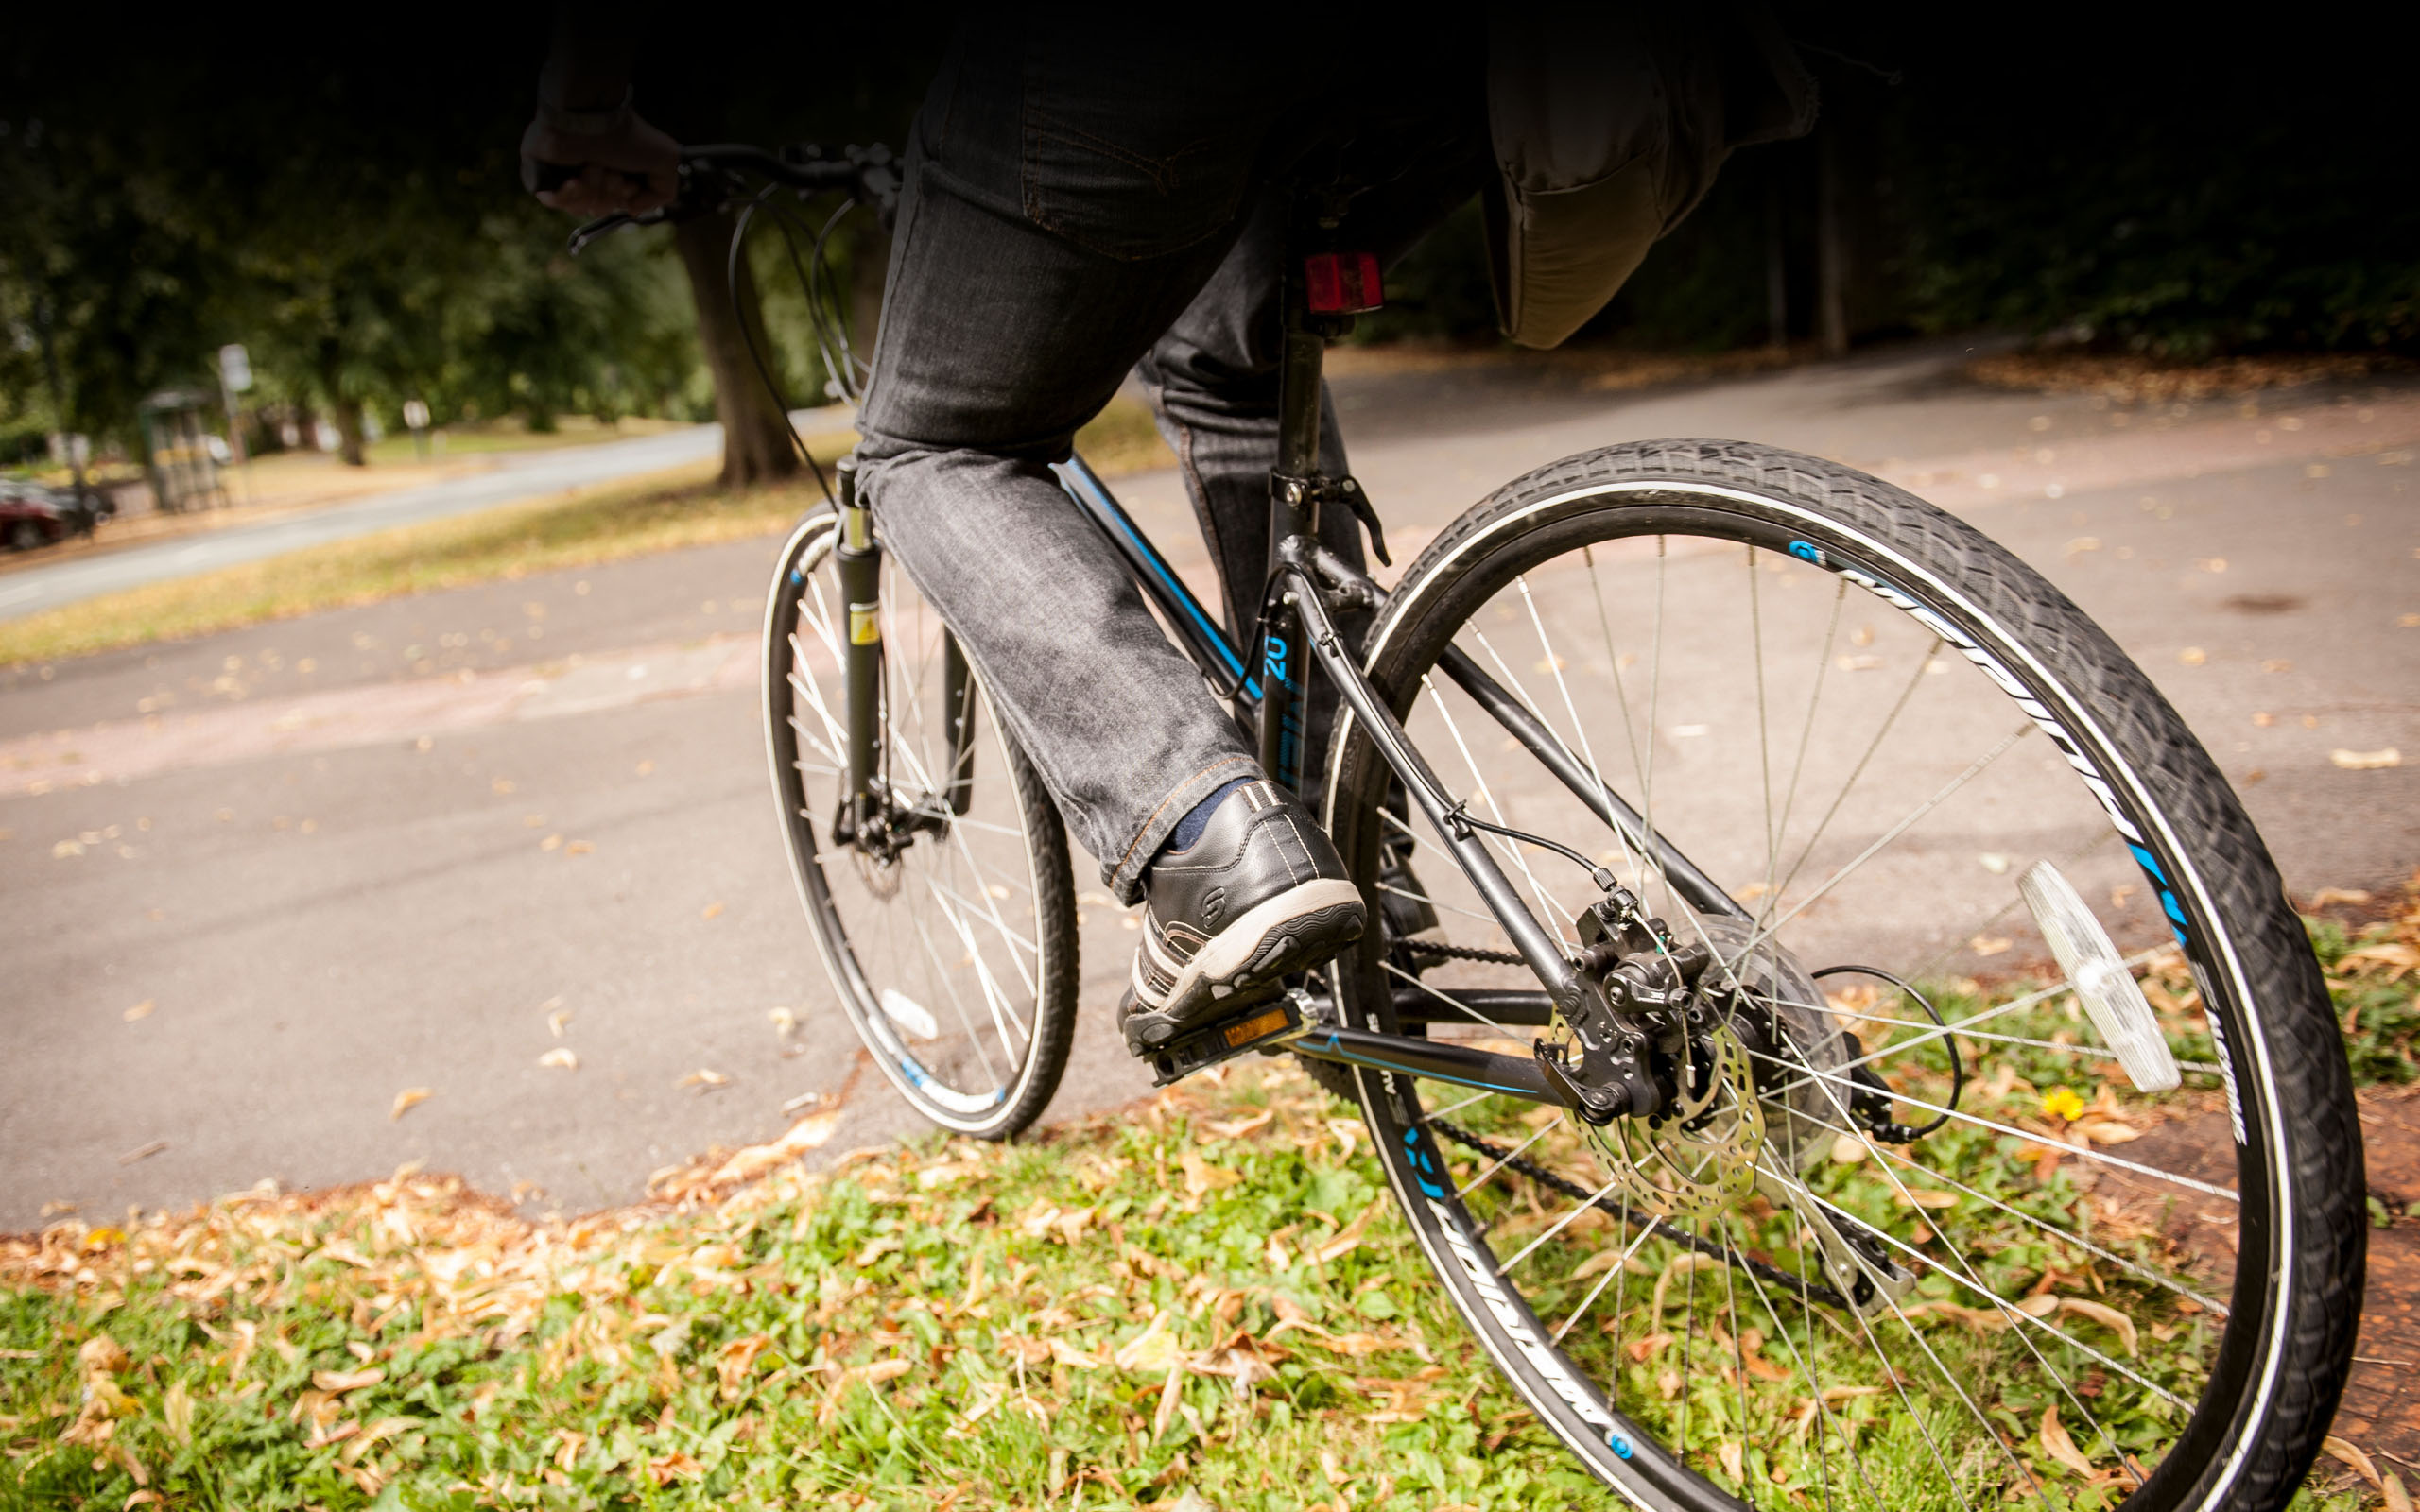 Close up image of bike